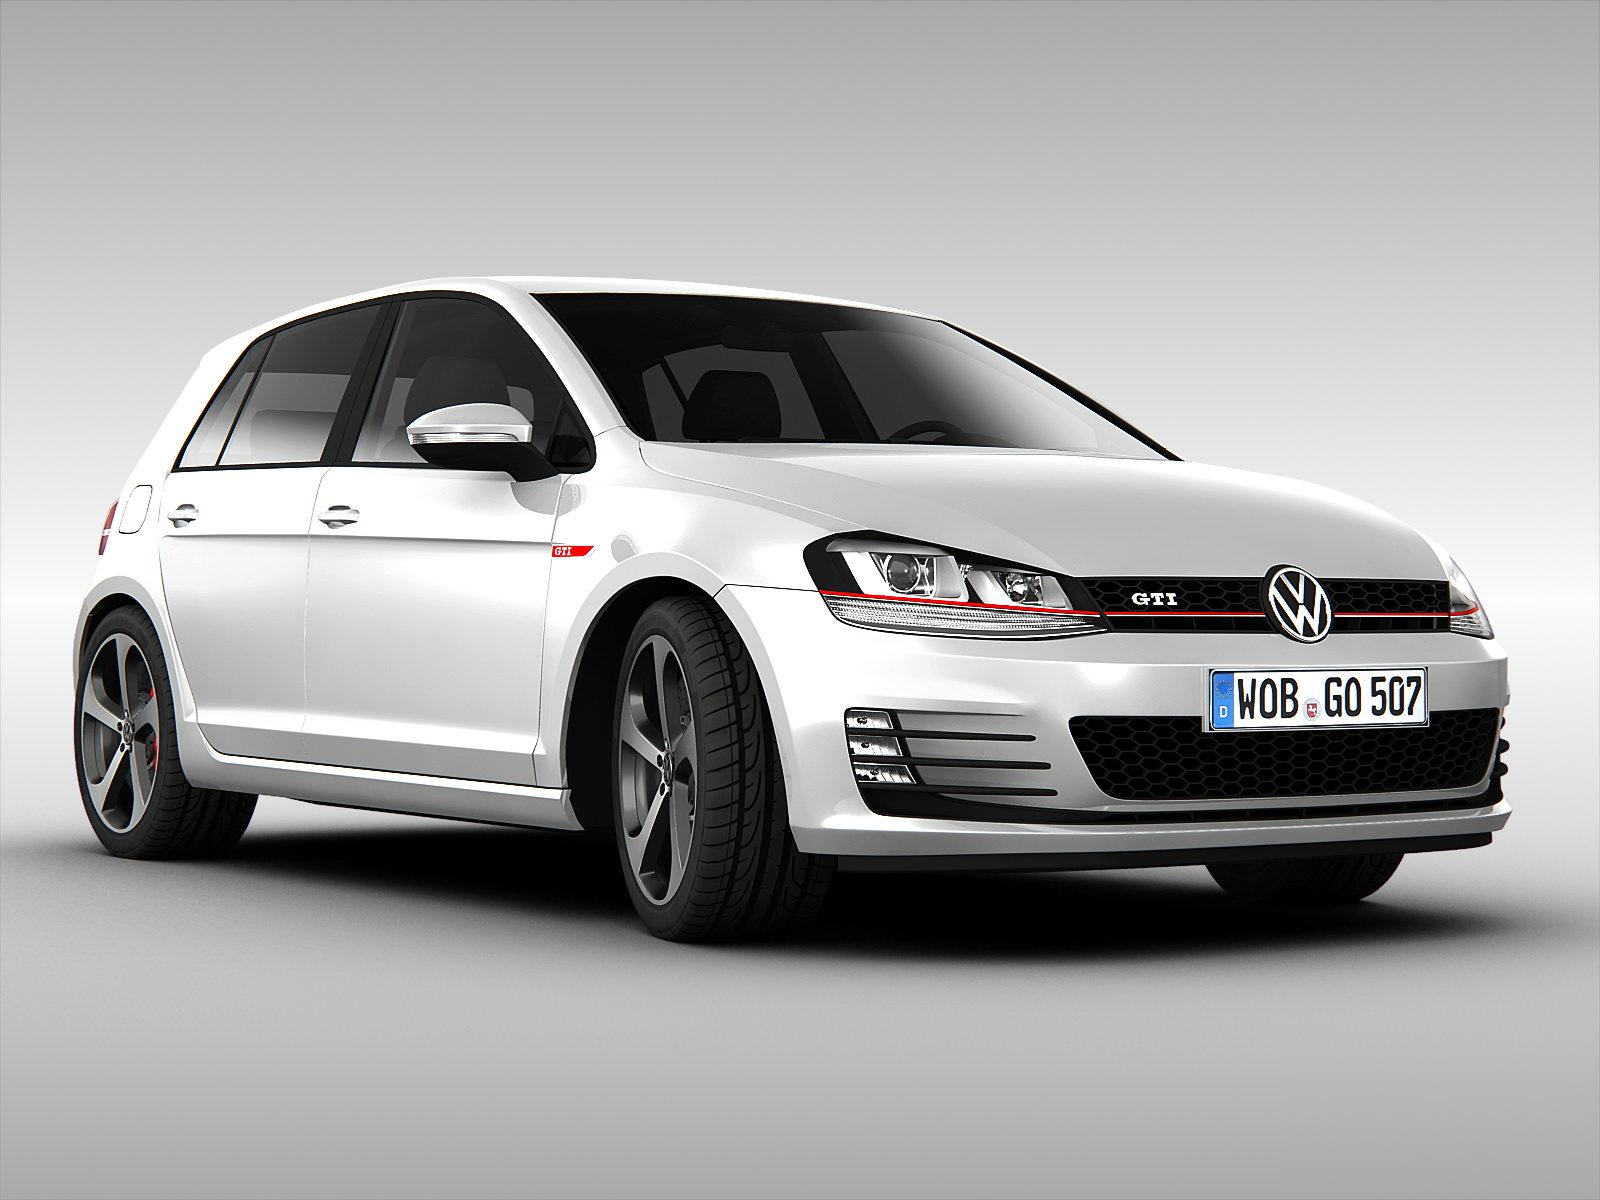 Volkswagen Golf GTI VII 2014 3D Model .max .obj .3ds .fbx - CGTrader.com